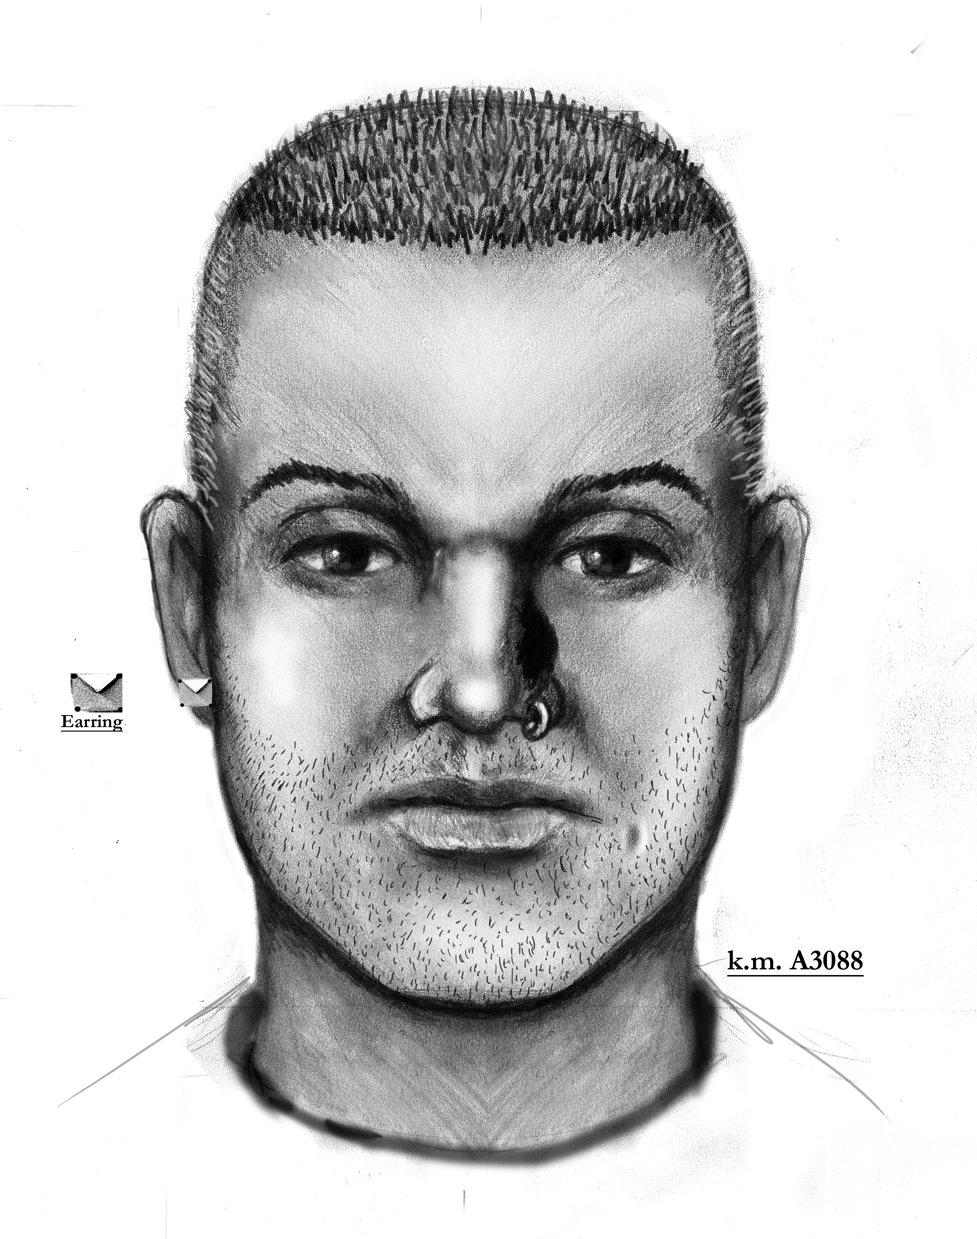 Description in the attempted kidnapping near 28th Avenue and Granada Road.